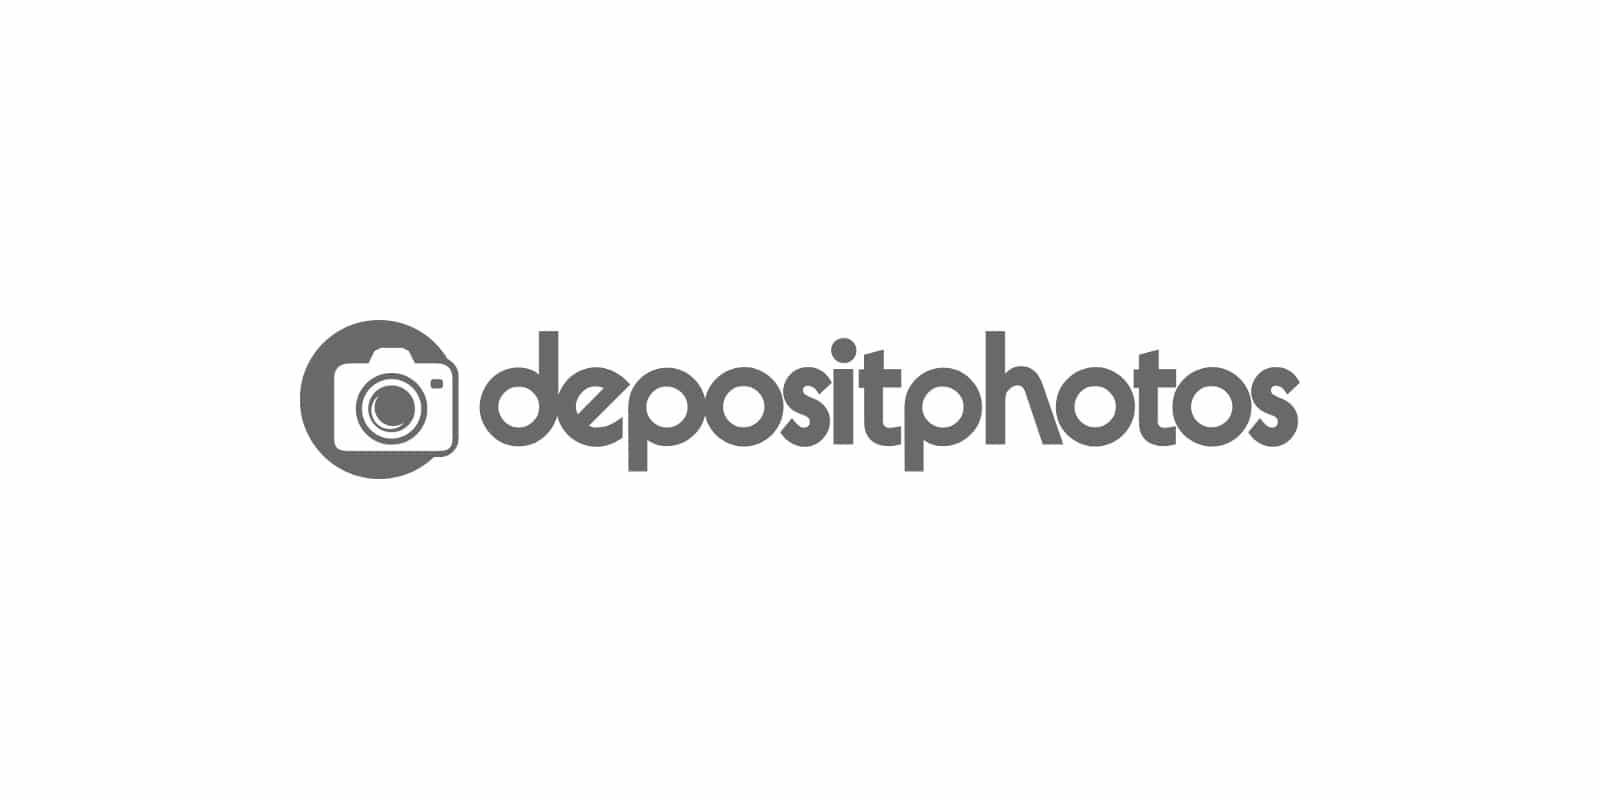 Depositphotos à -10%